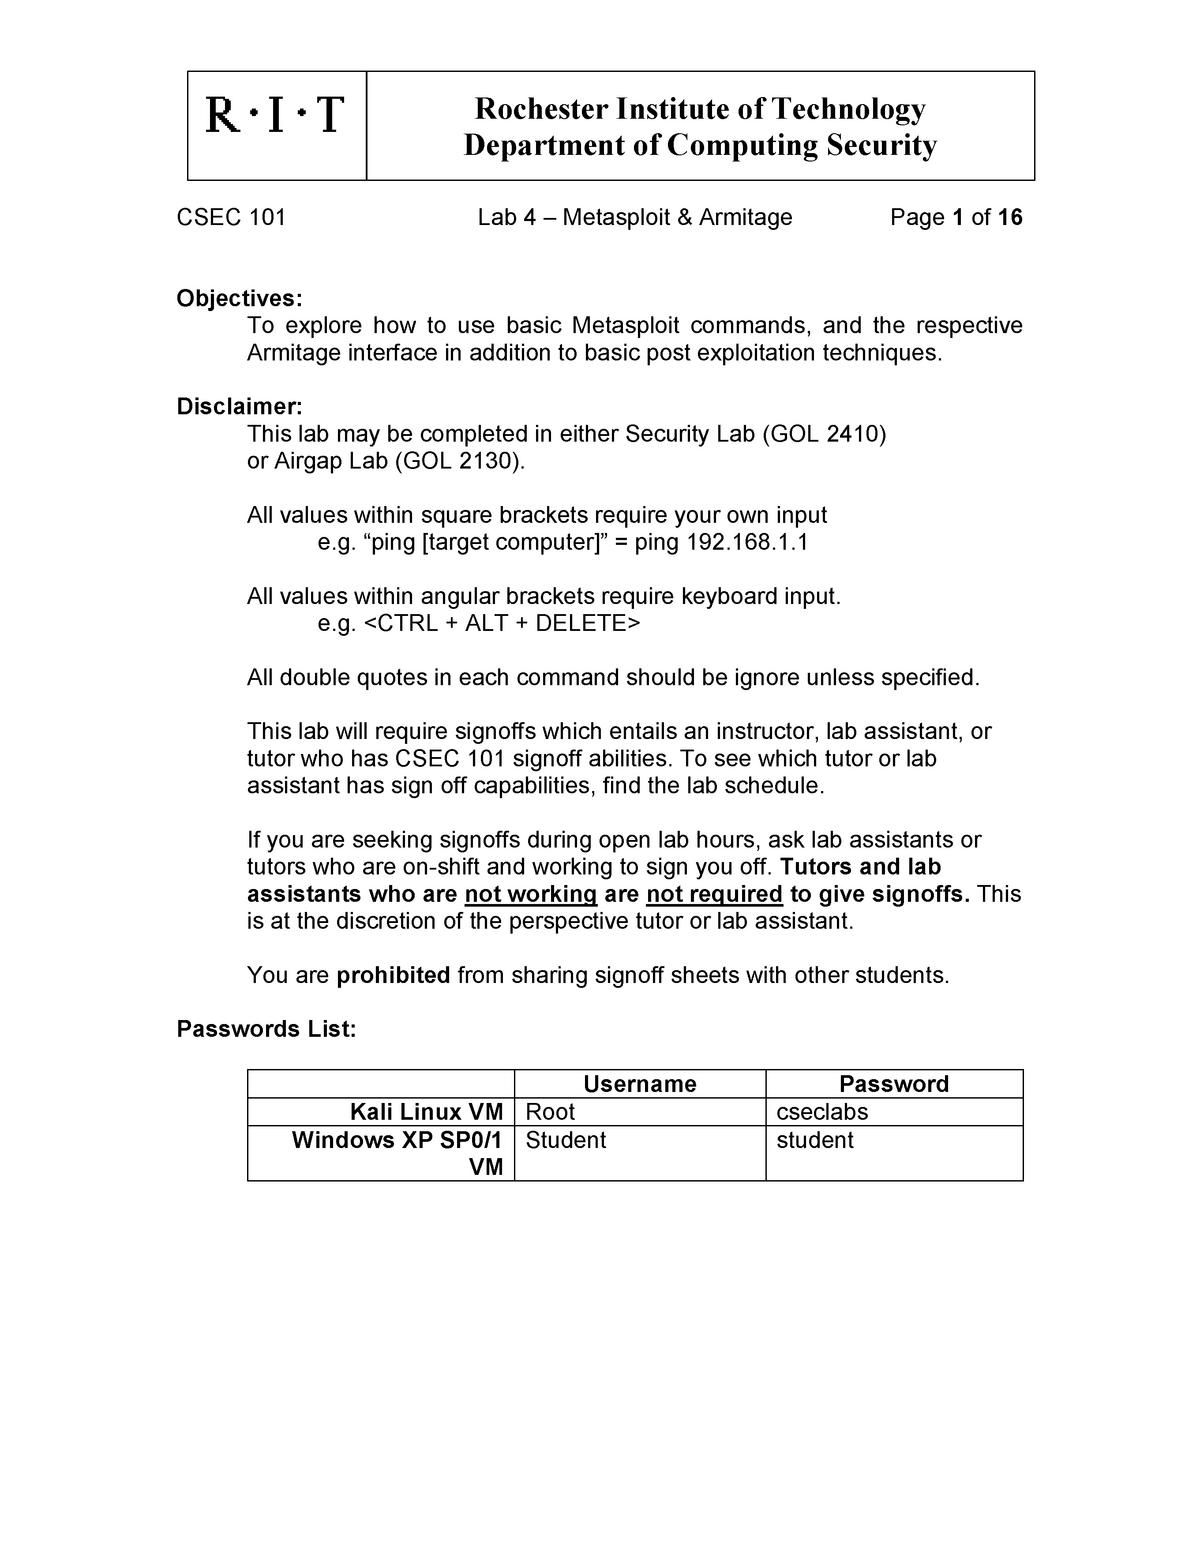 Lab 4 – Metasploit & Armitage - CSEC 101: Fundamentals of